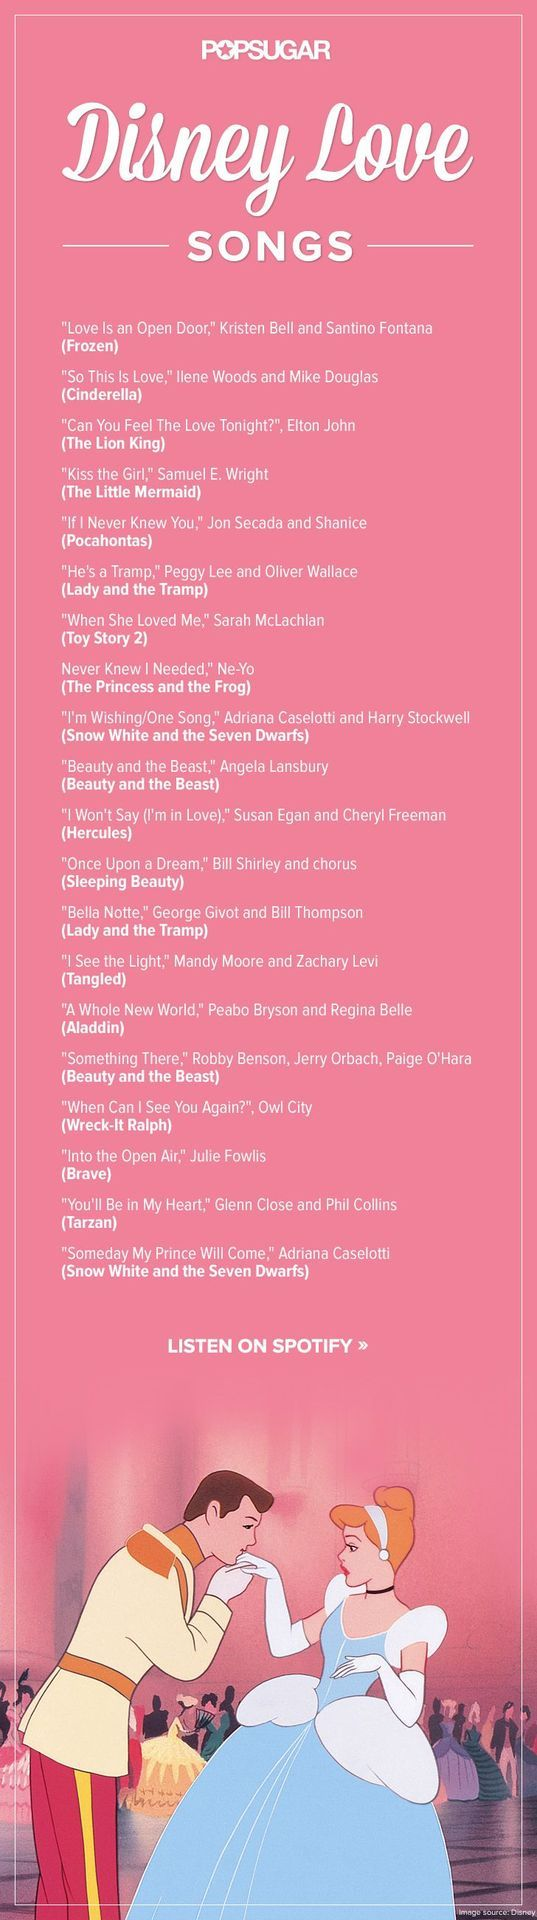 Disney Love Songs. For Disney weddings.